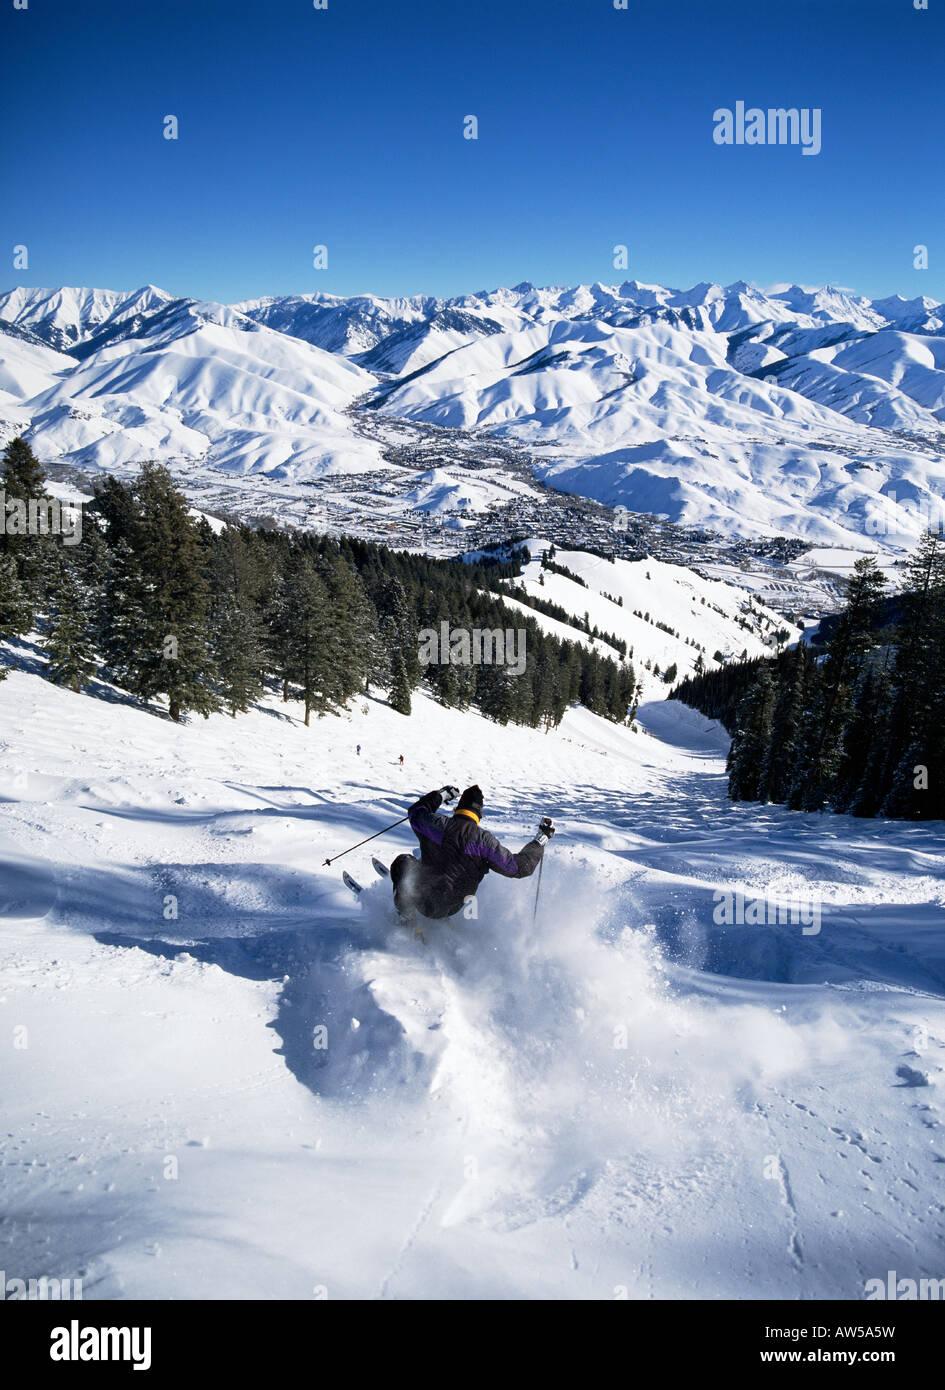 Sun Valley ski area - Stock Image